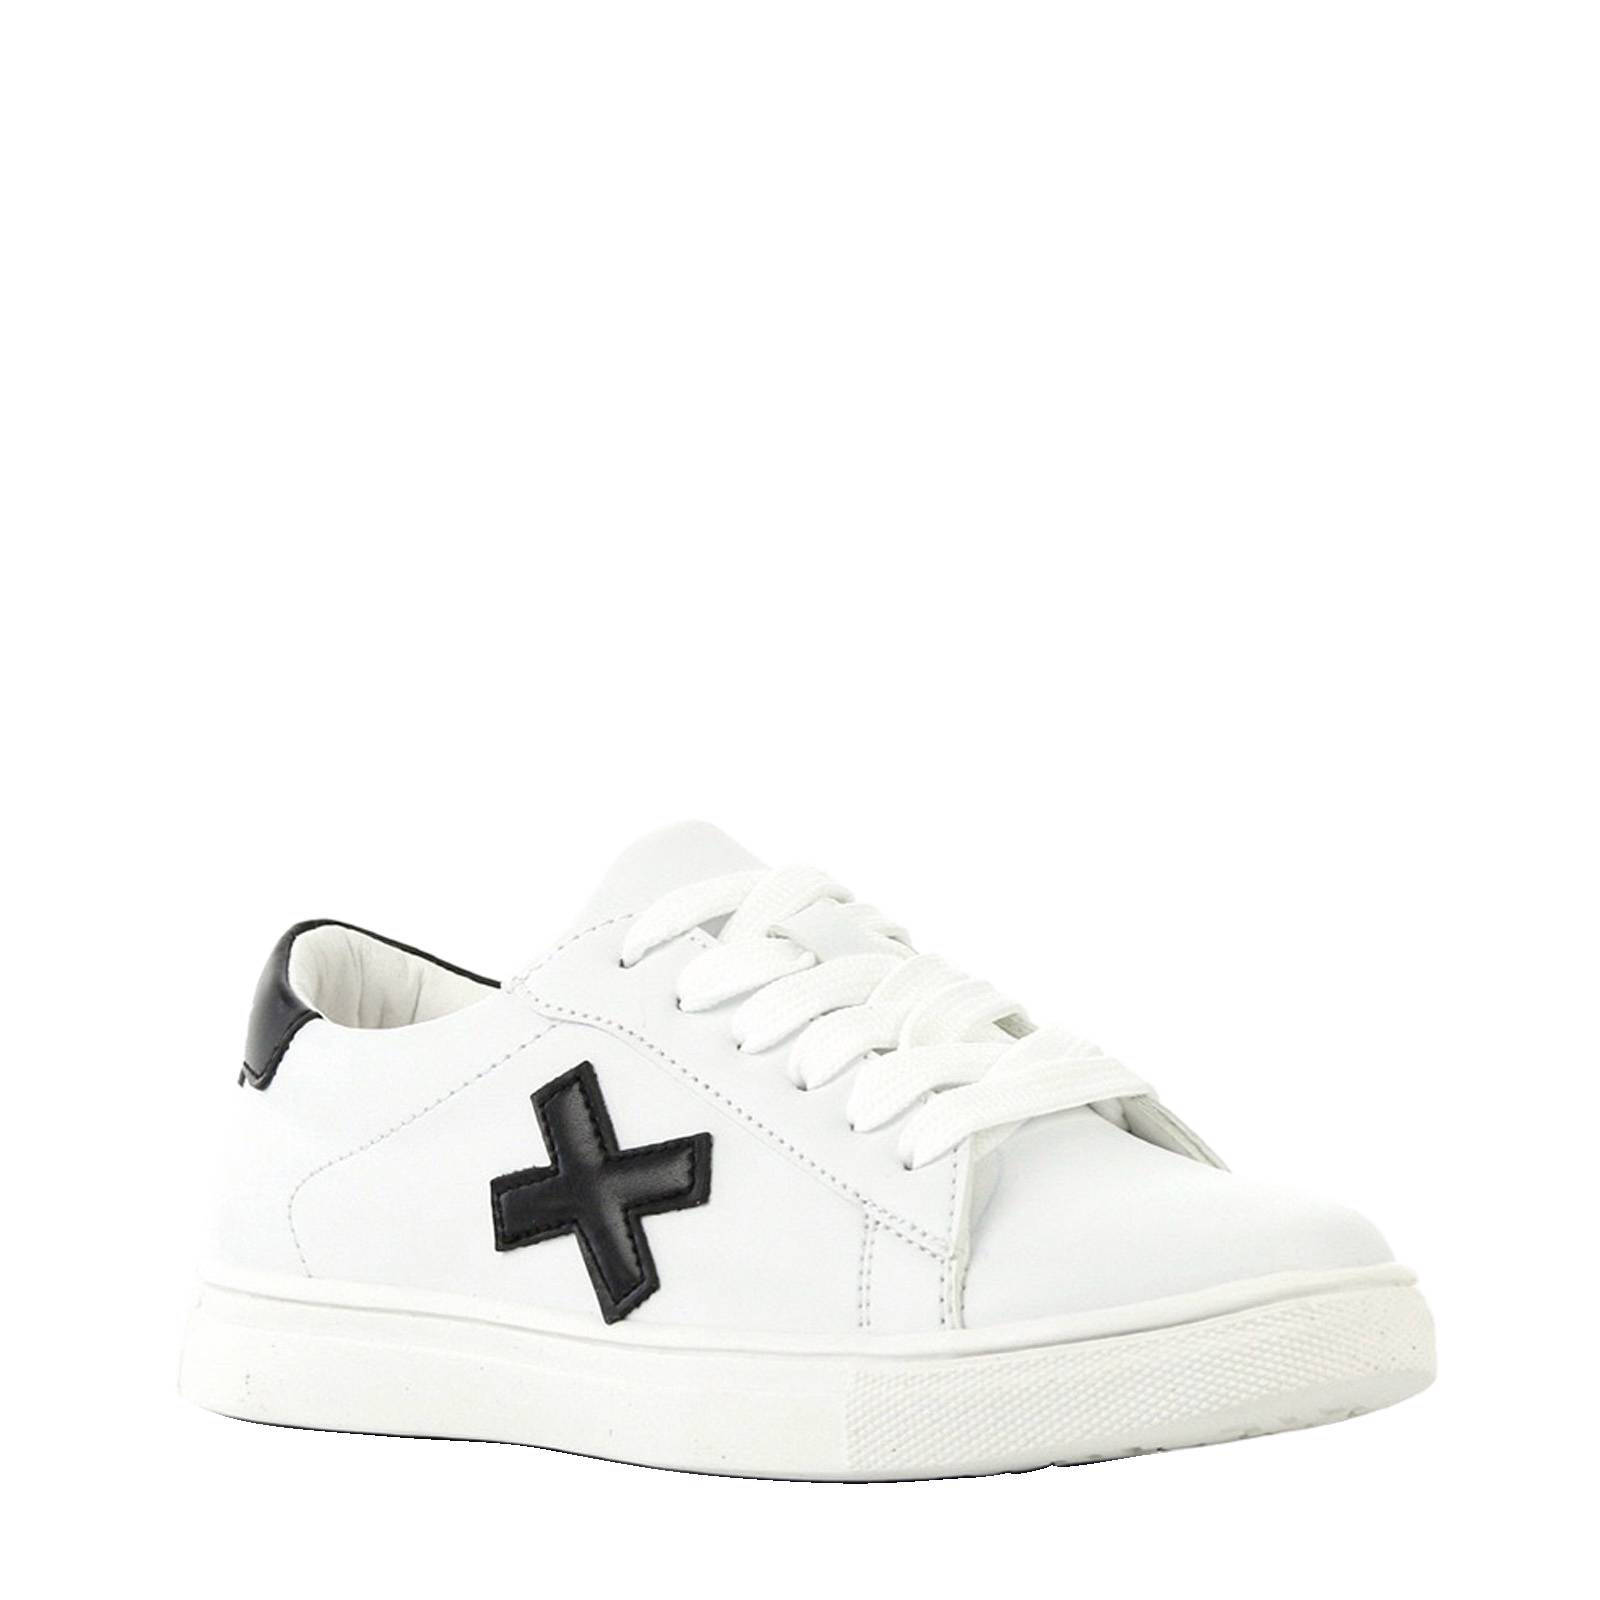 Nik & Nik Joe Sneaker Esprit yDn41